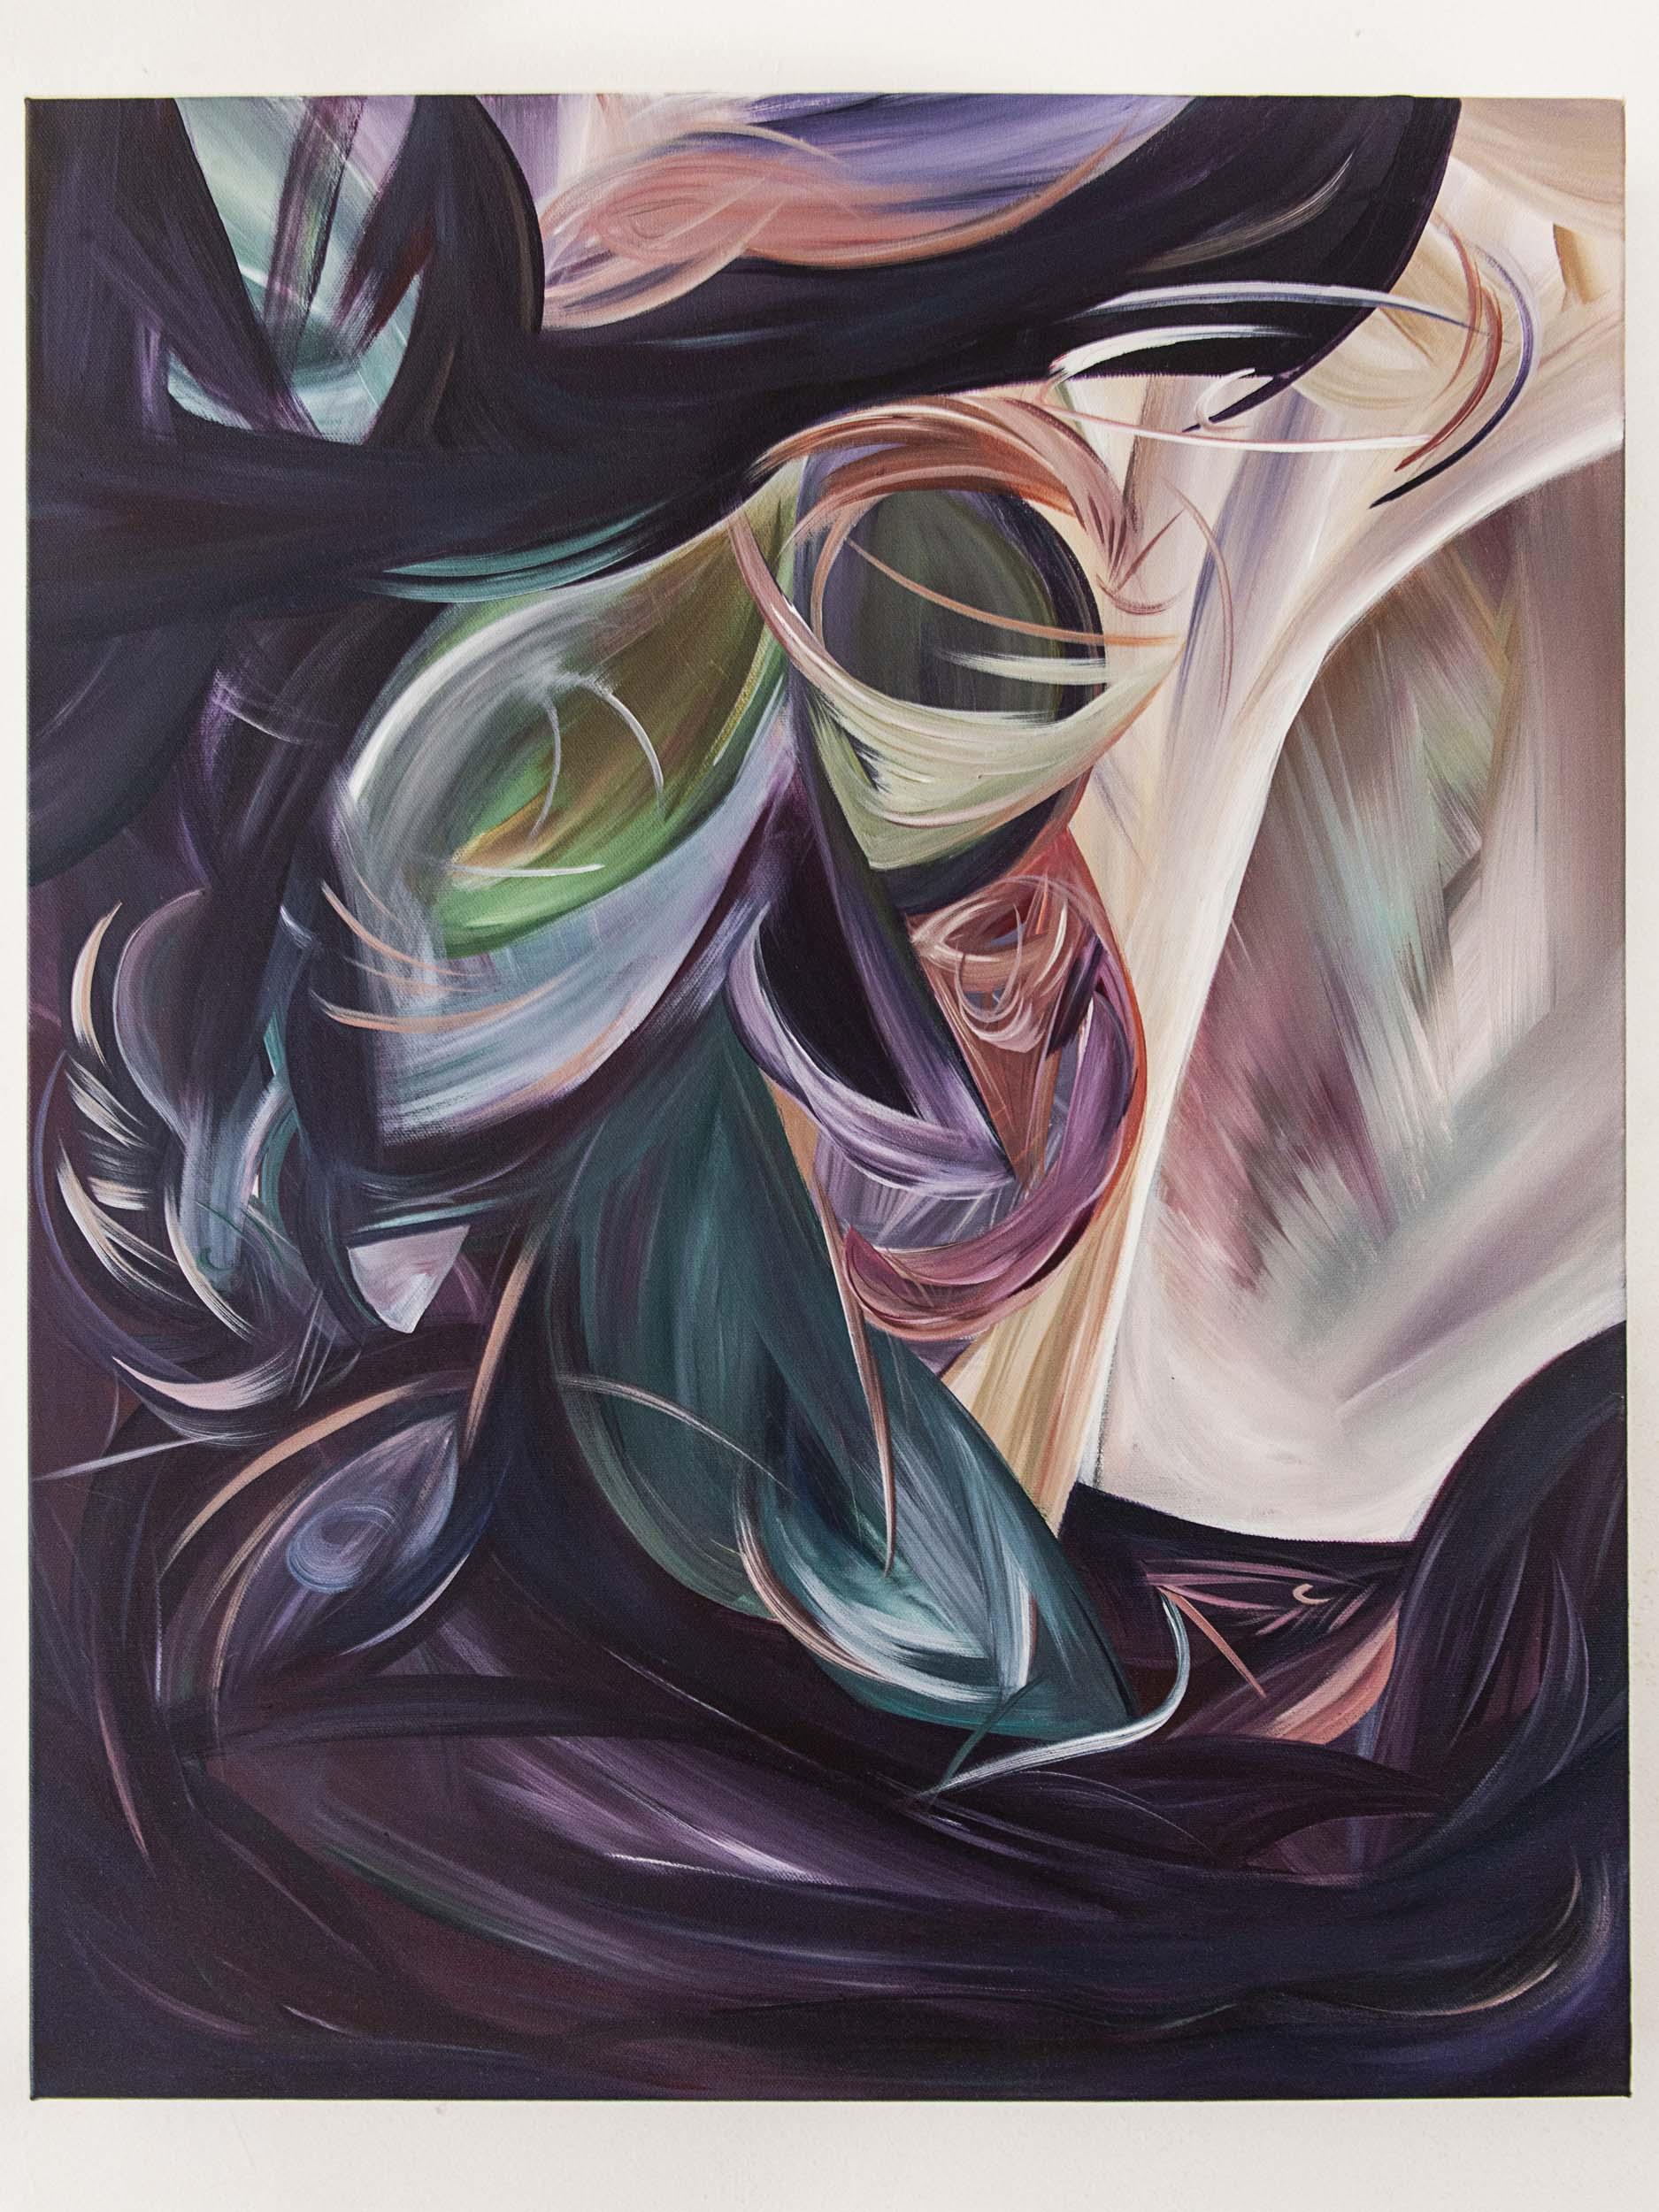 Gaping, Vanishing/切割,消逝, 2020,acrylic on canvas,28x22 inches